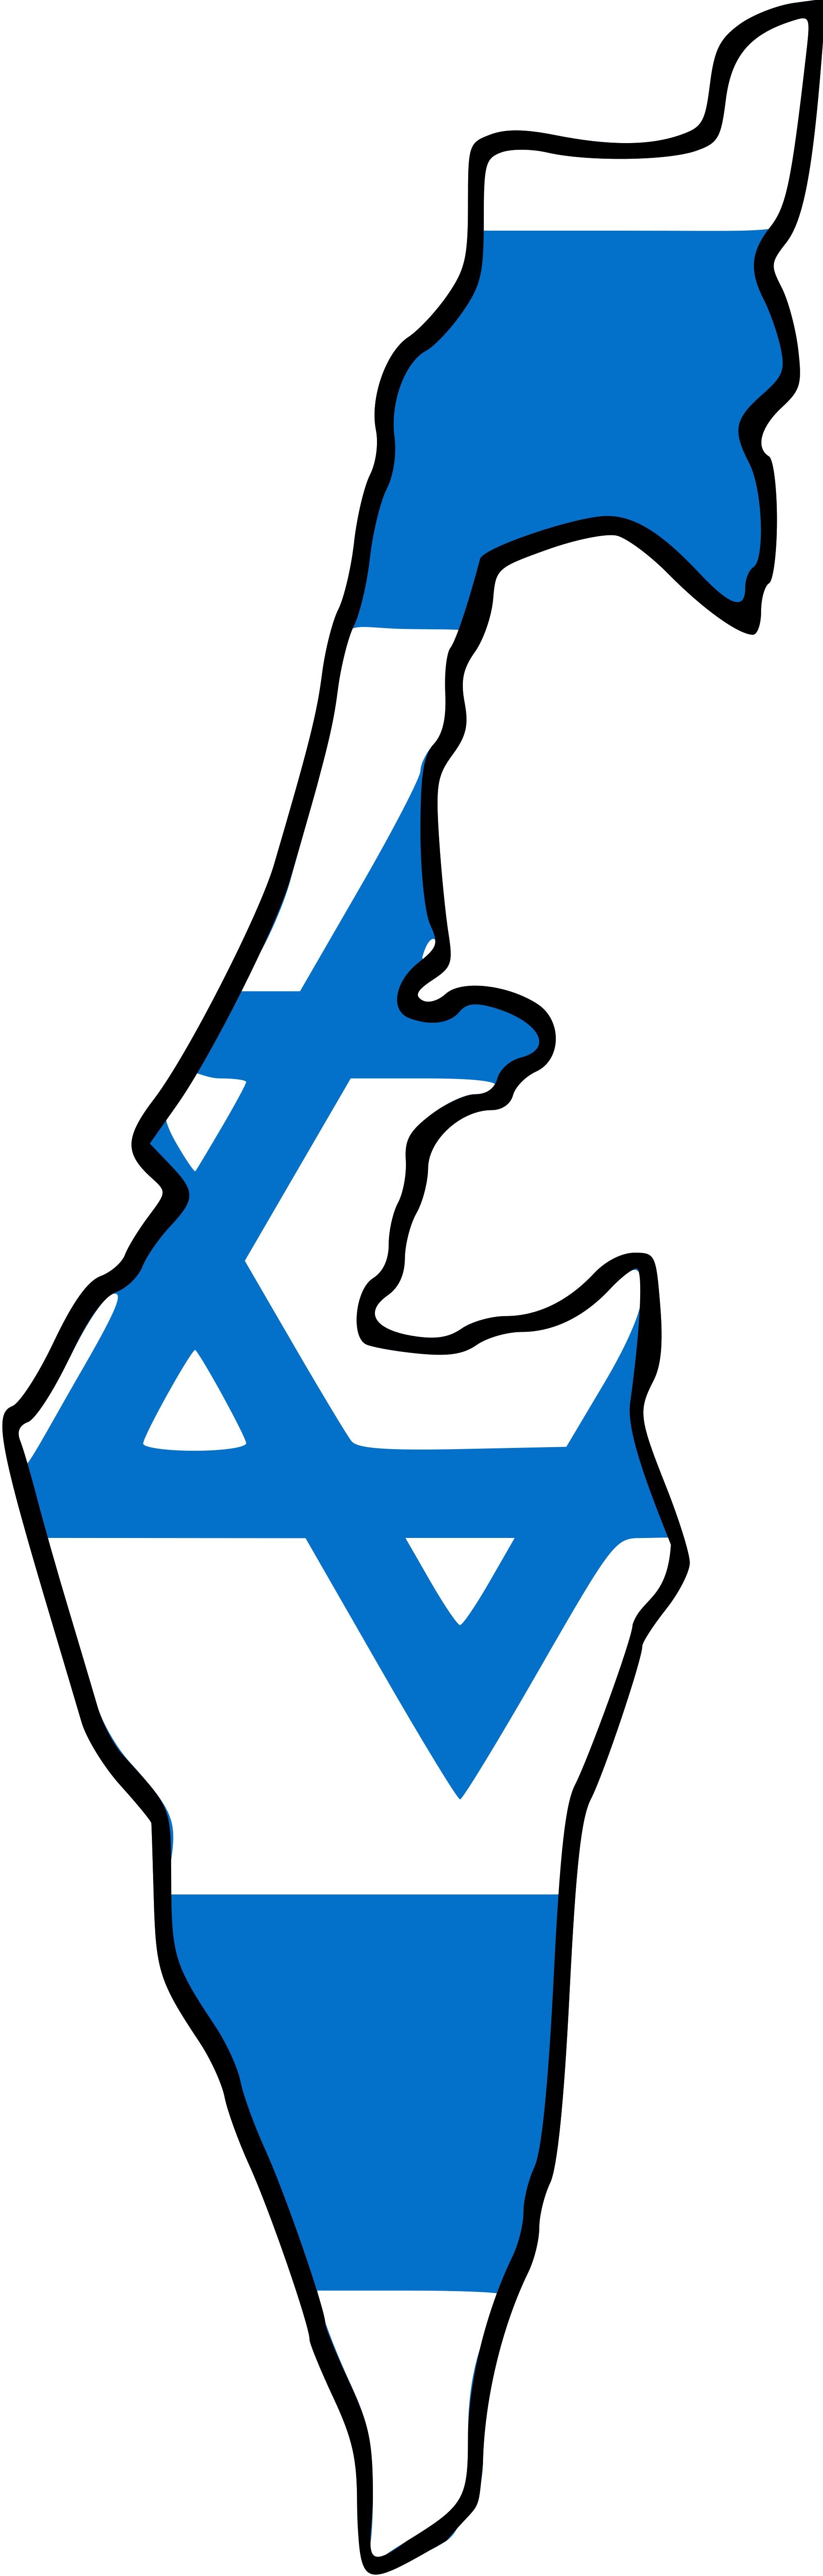 Israel Flag Hd Clipart.